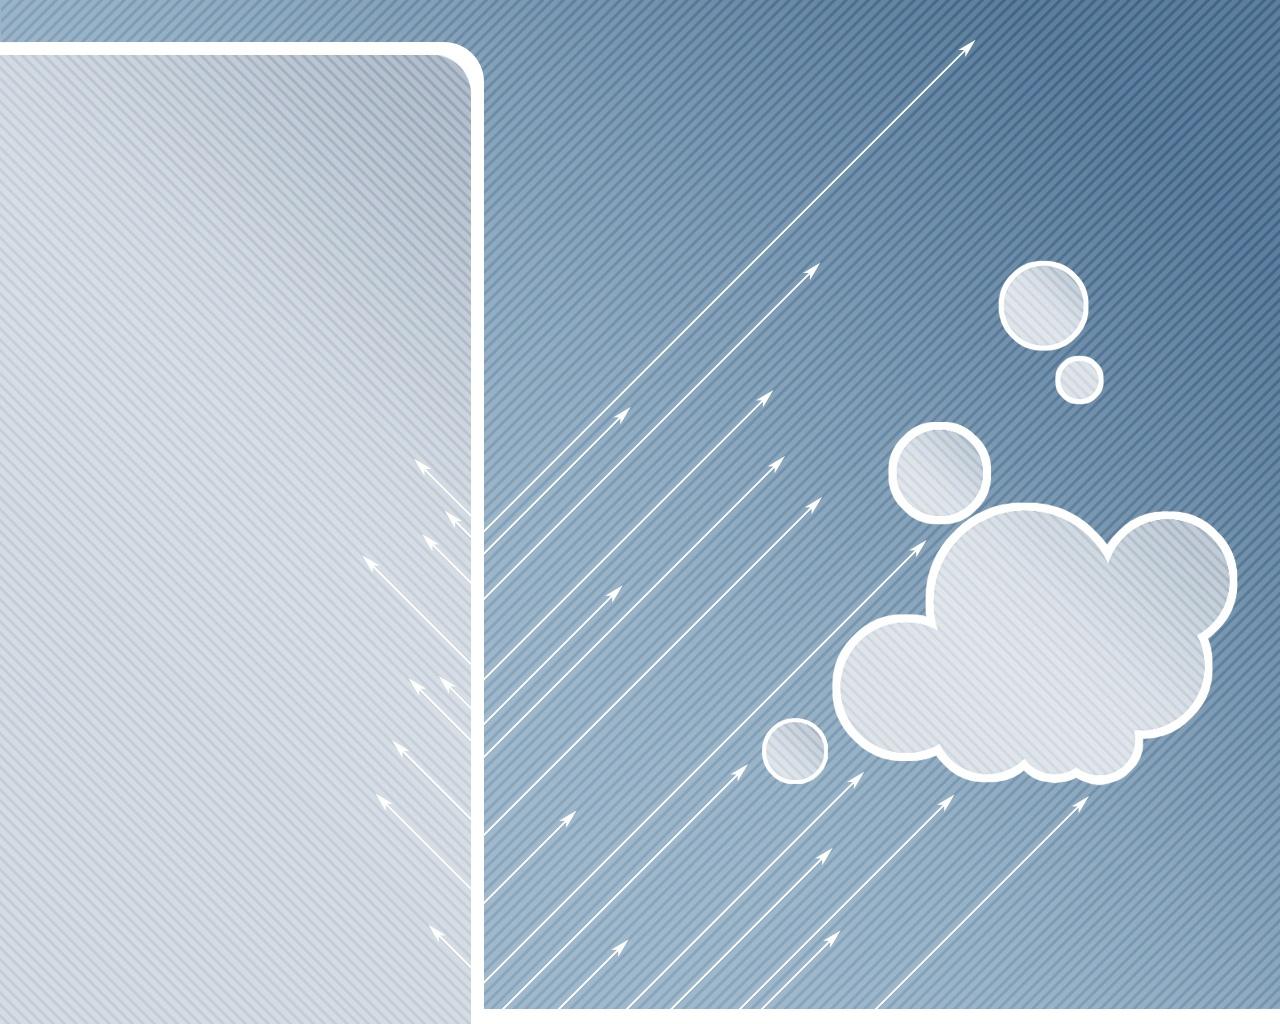 Lowes Wallpaper In Stock httpwallpaperstocknetblue forms 1280x1024